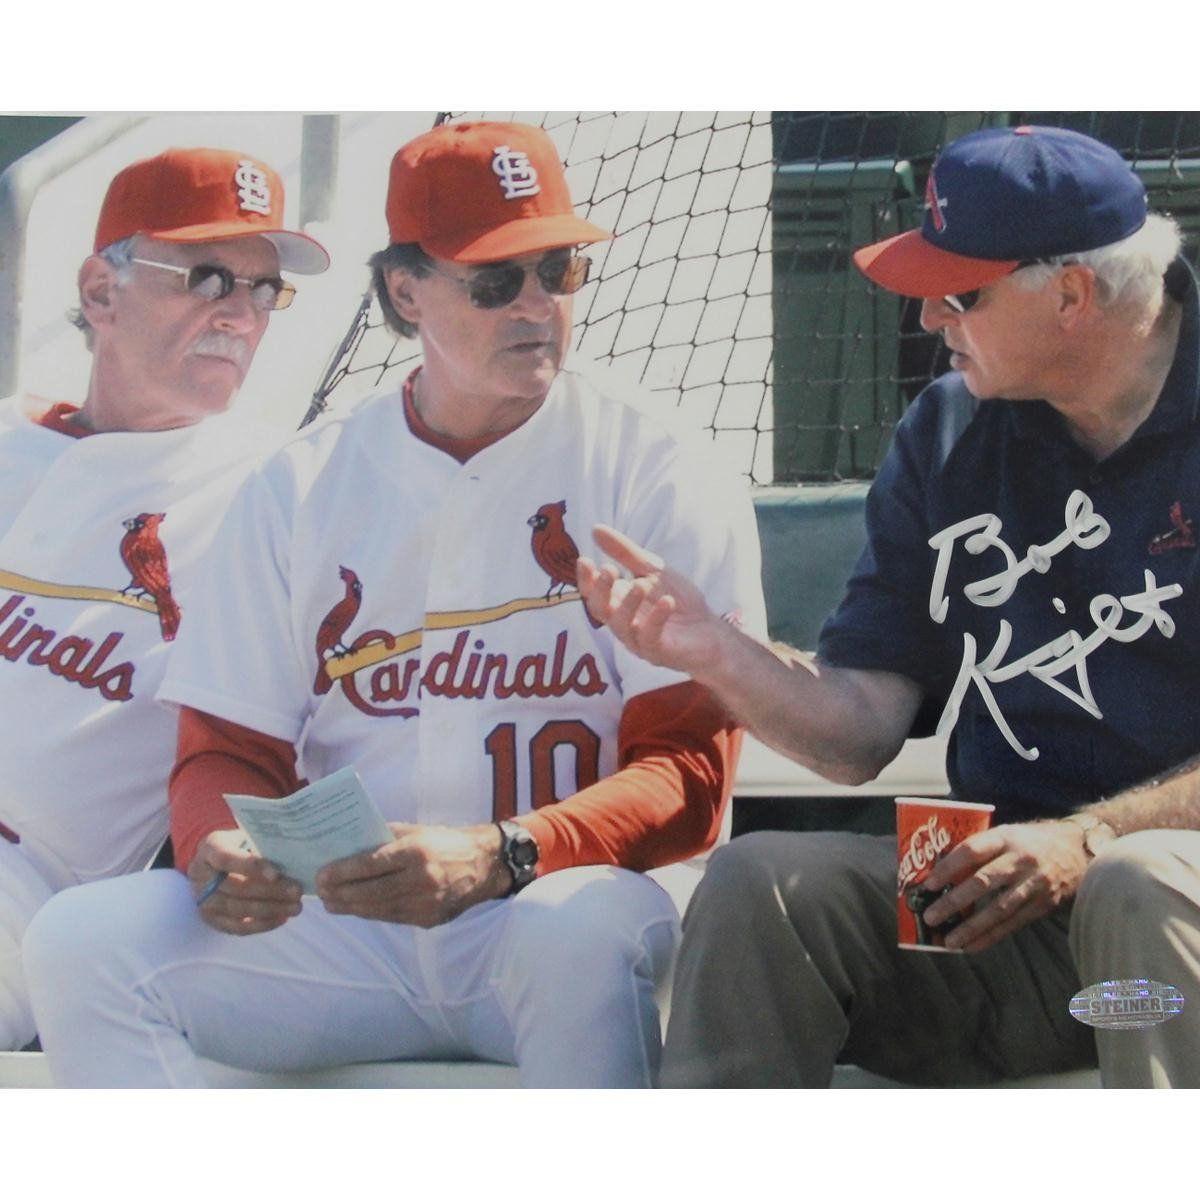 Bob Knight Signed 8x10 W Jim Leyland & Tony La Russa Bob